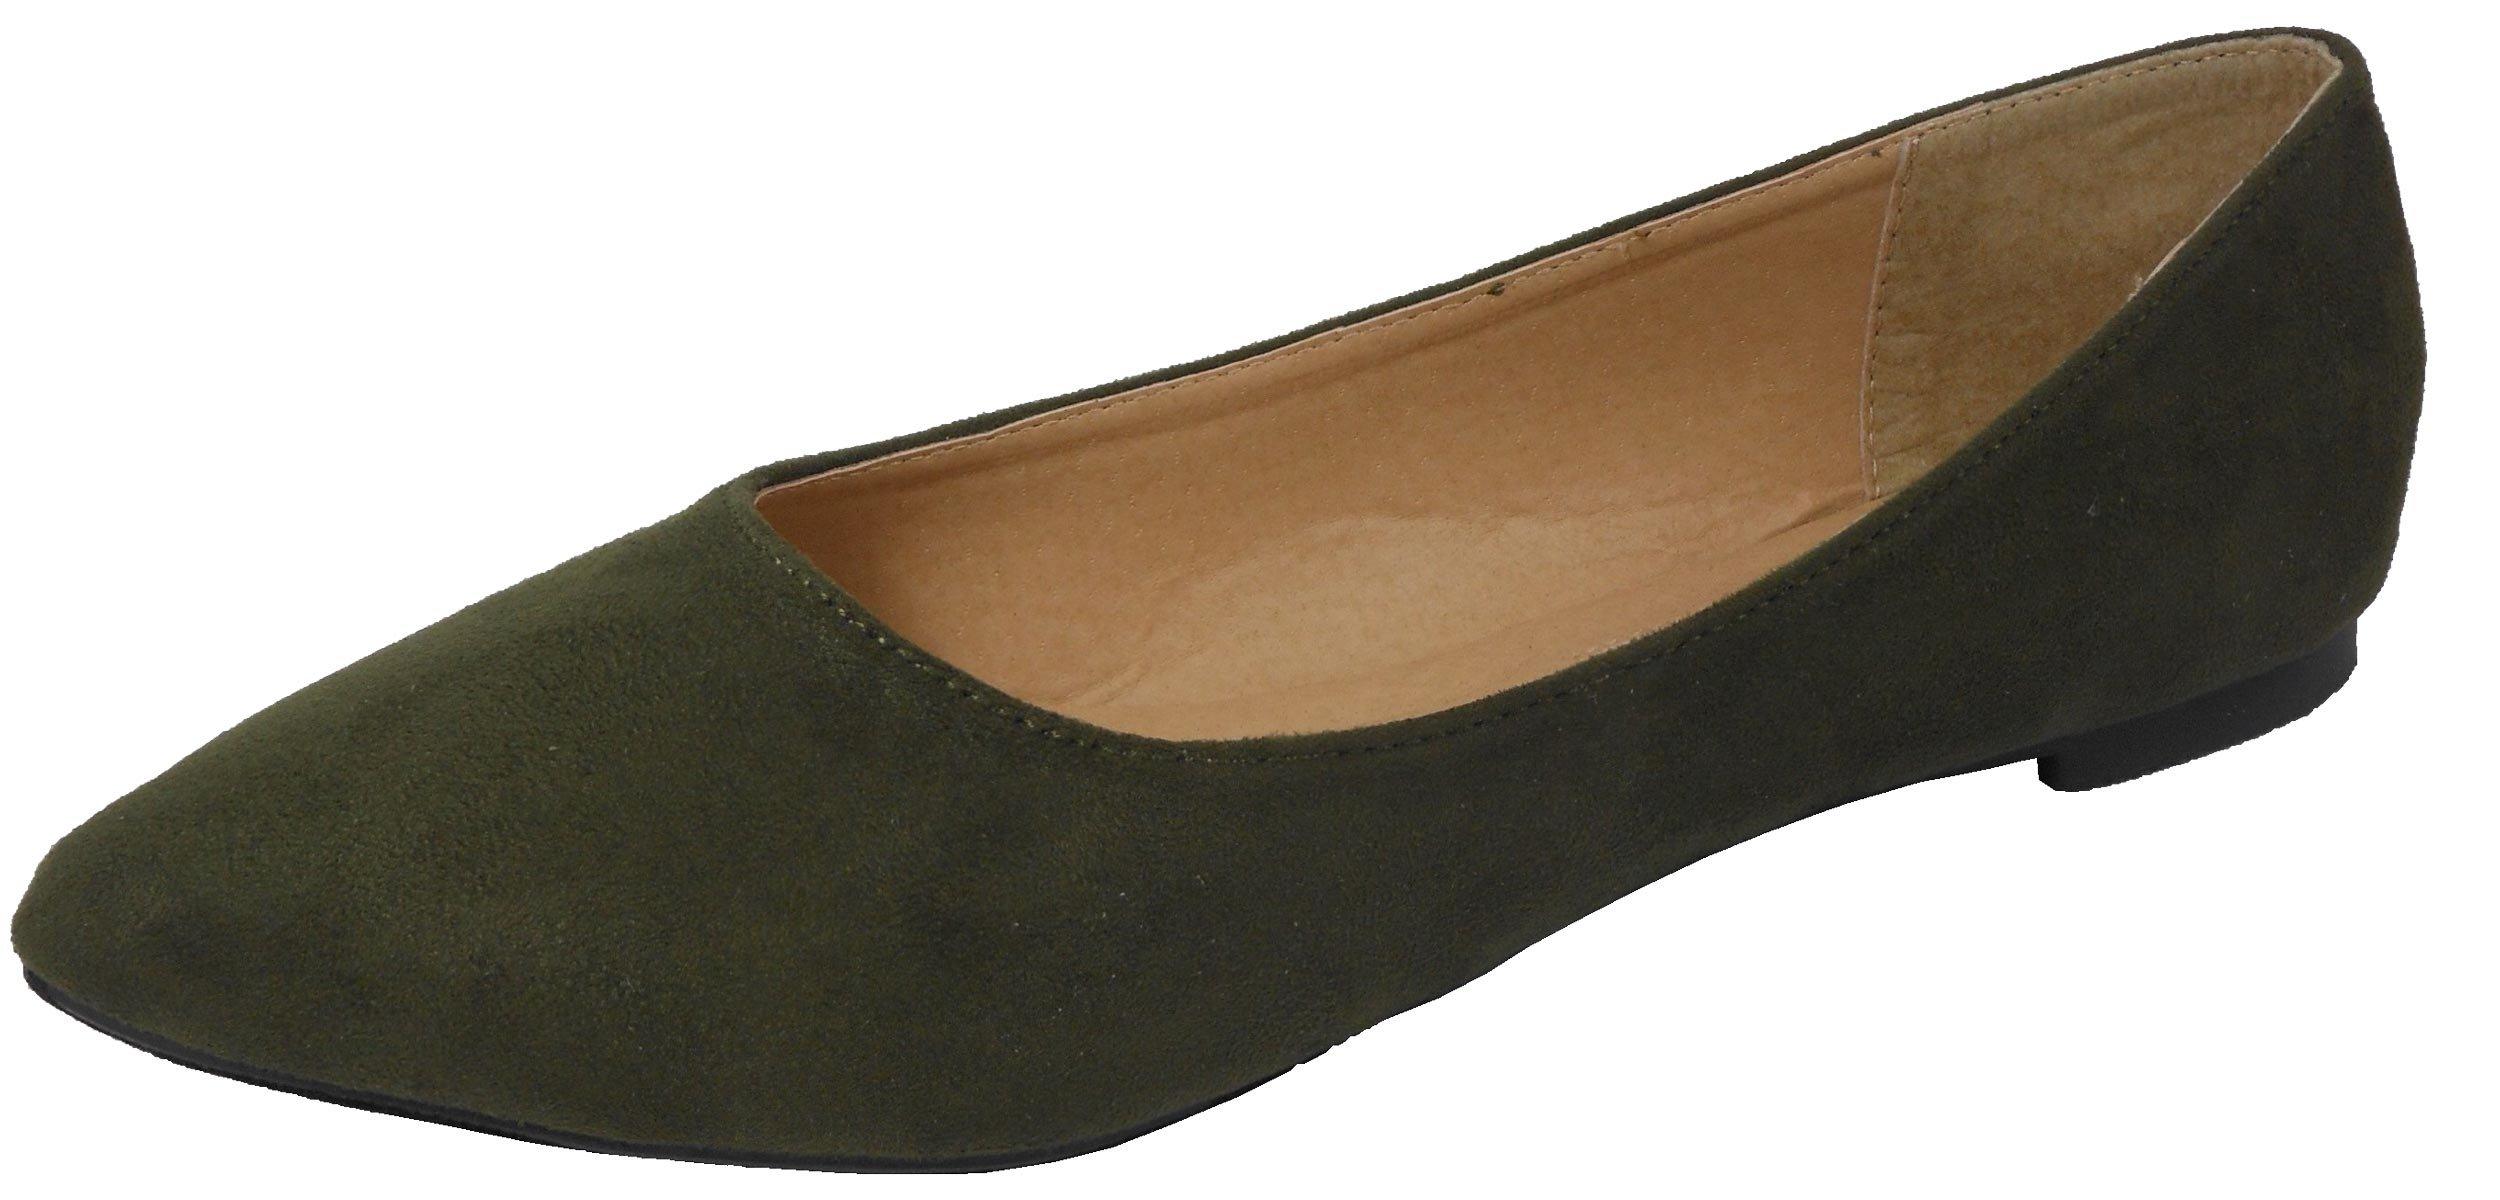 Jynx Women's Pointed Toe Slip on Ballet Flat Betty-1 Olive 7.5